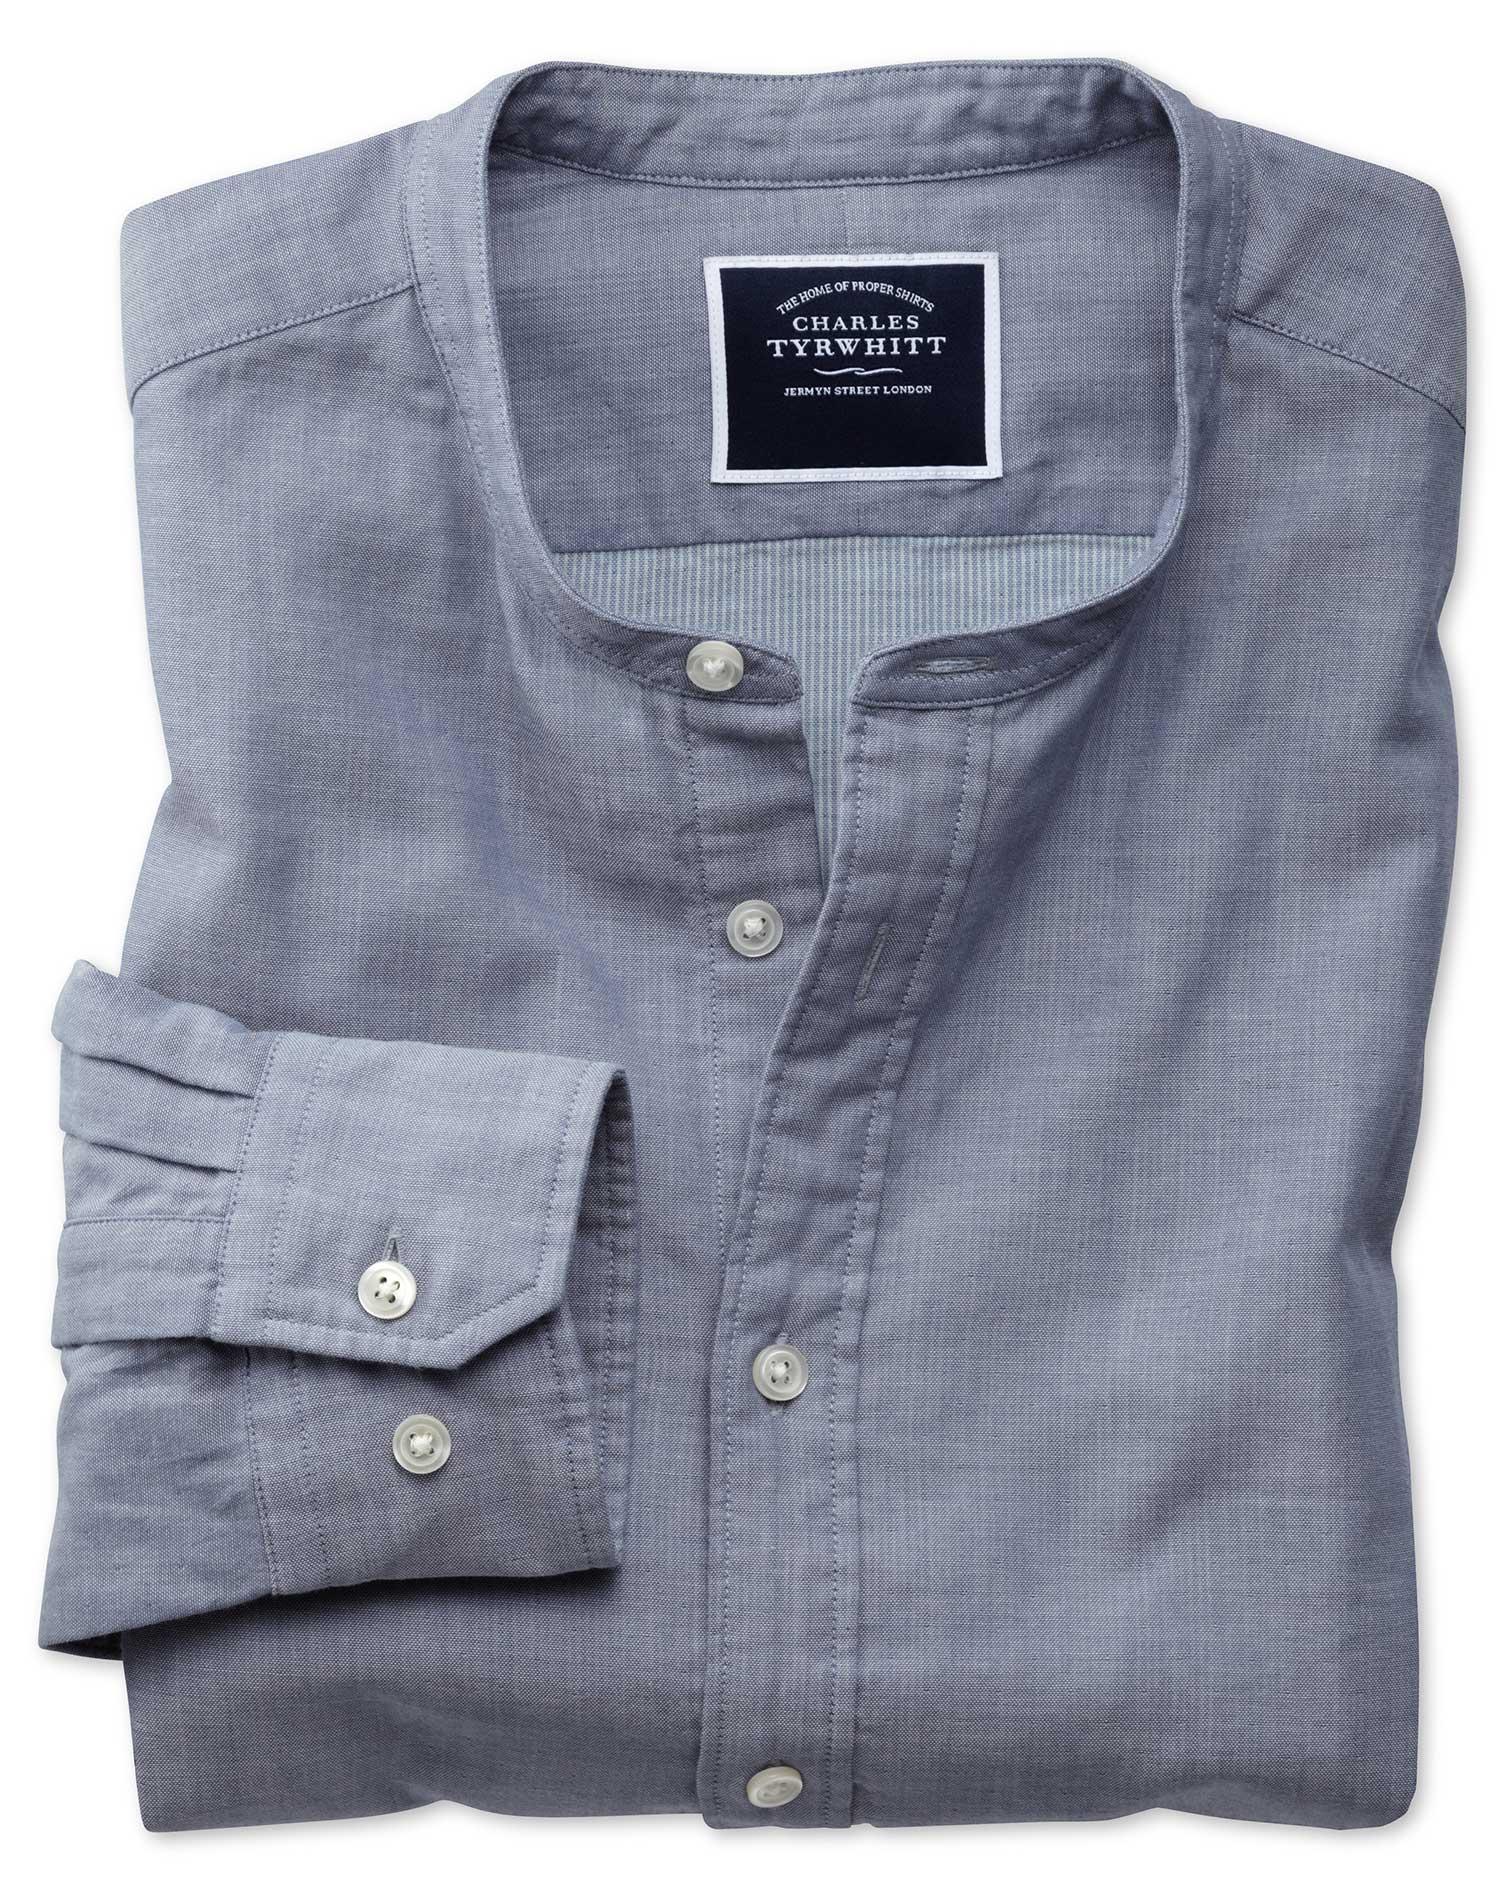 Slim Fit Collarless Chambray Cotton Shirt Single Cuff Size XS by Charles Tyrwhitt